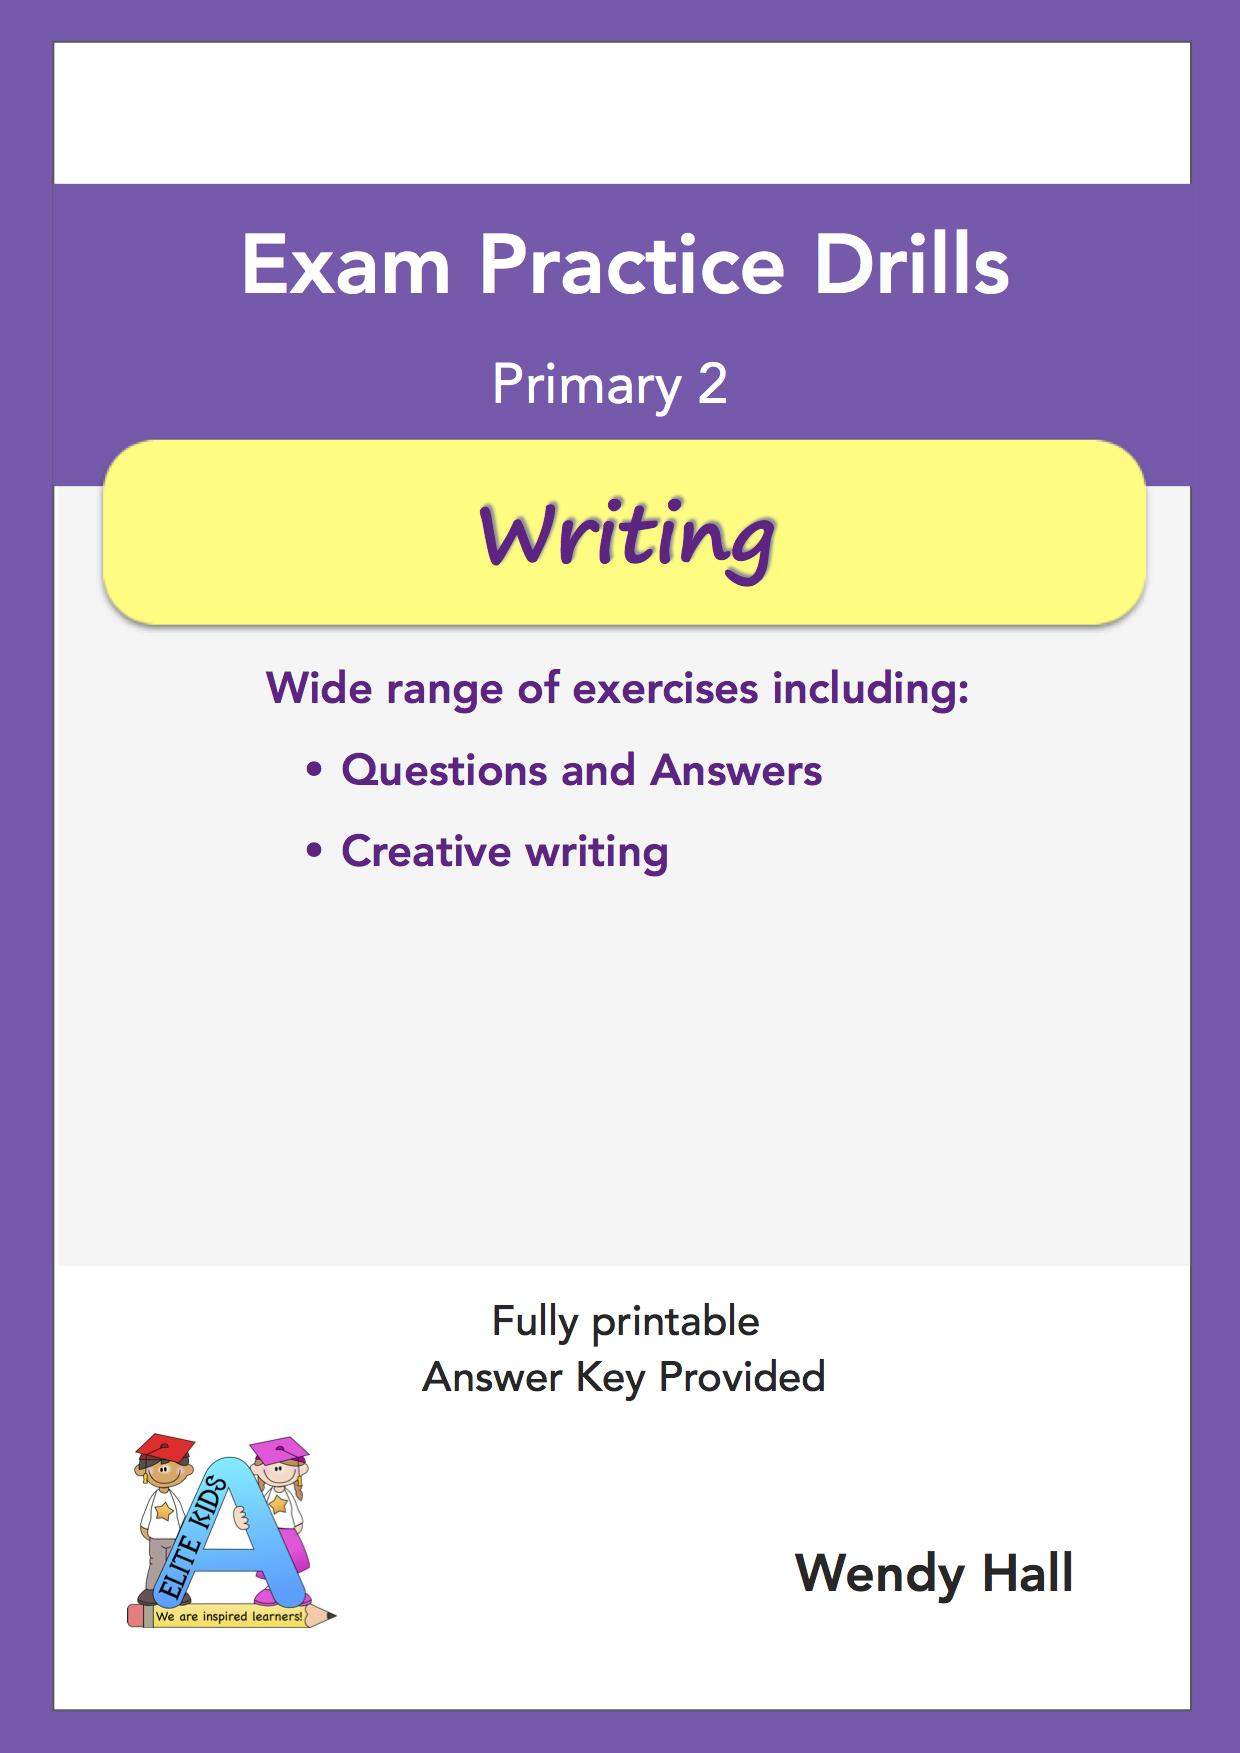 Elite Kids | Exam Practice Drills - Writing - Primary 2